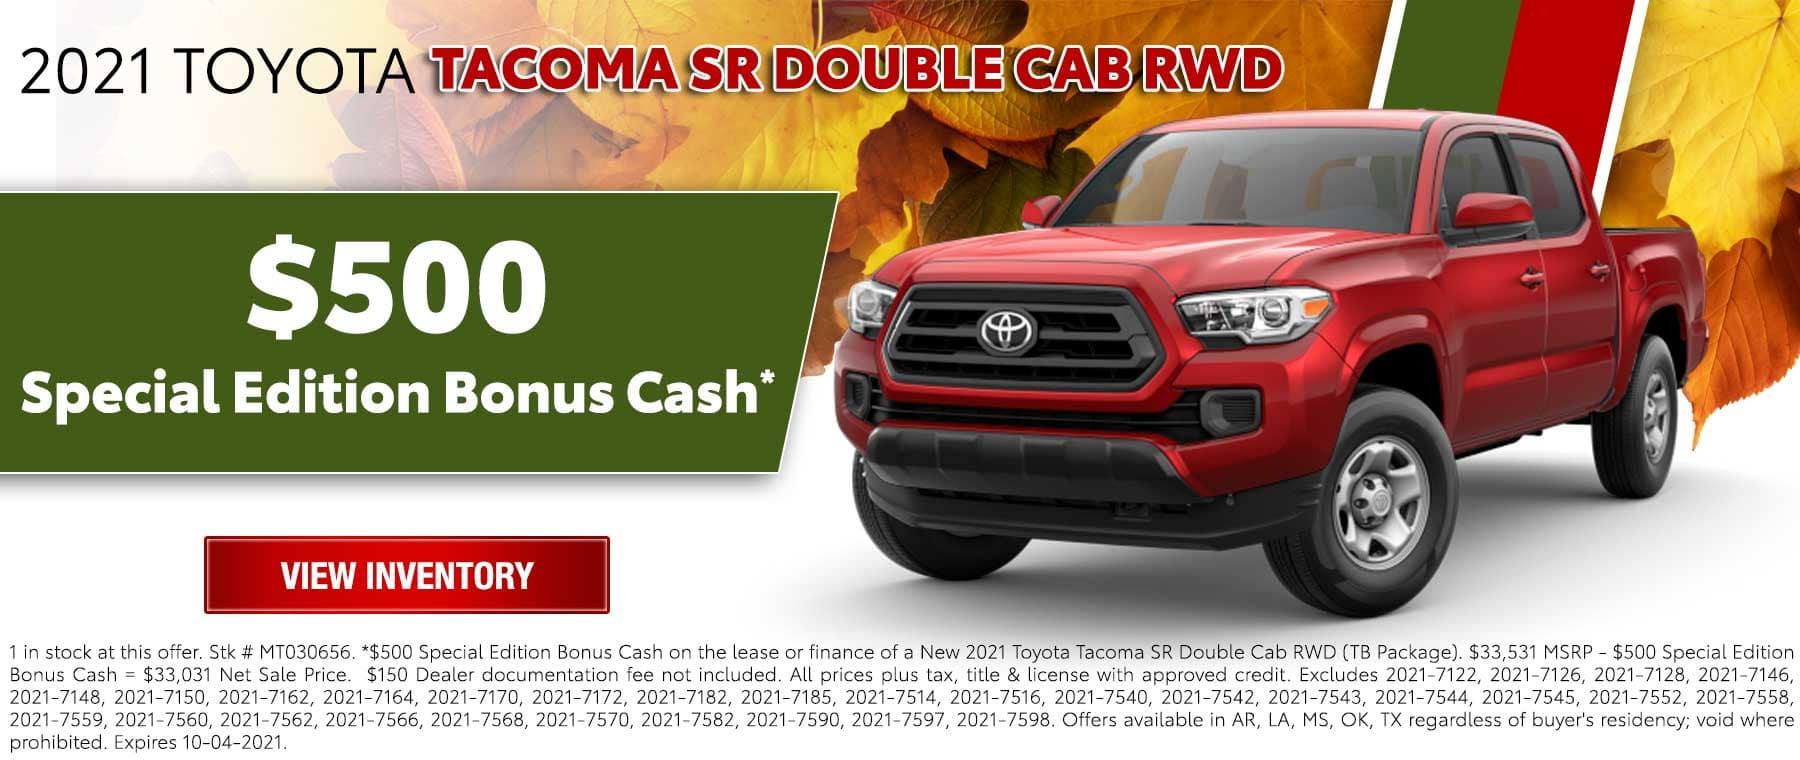 New 2021 Toyota Tacoma SR Double Cab RWD